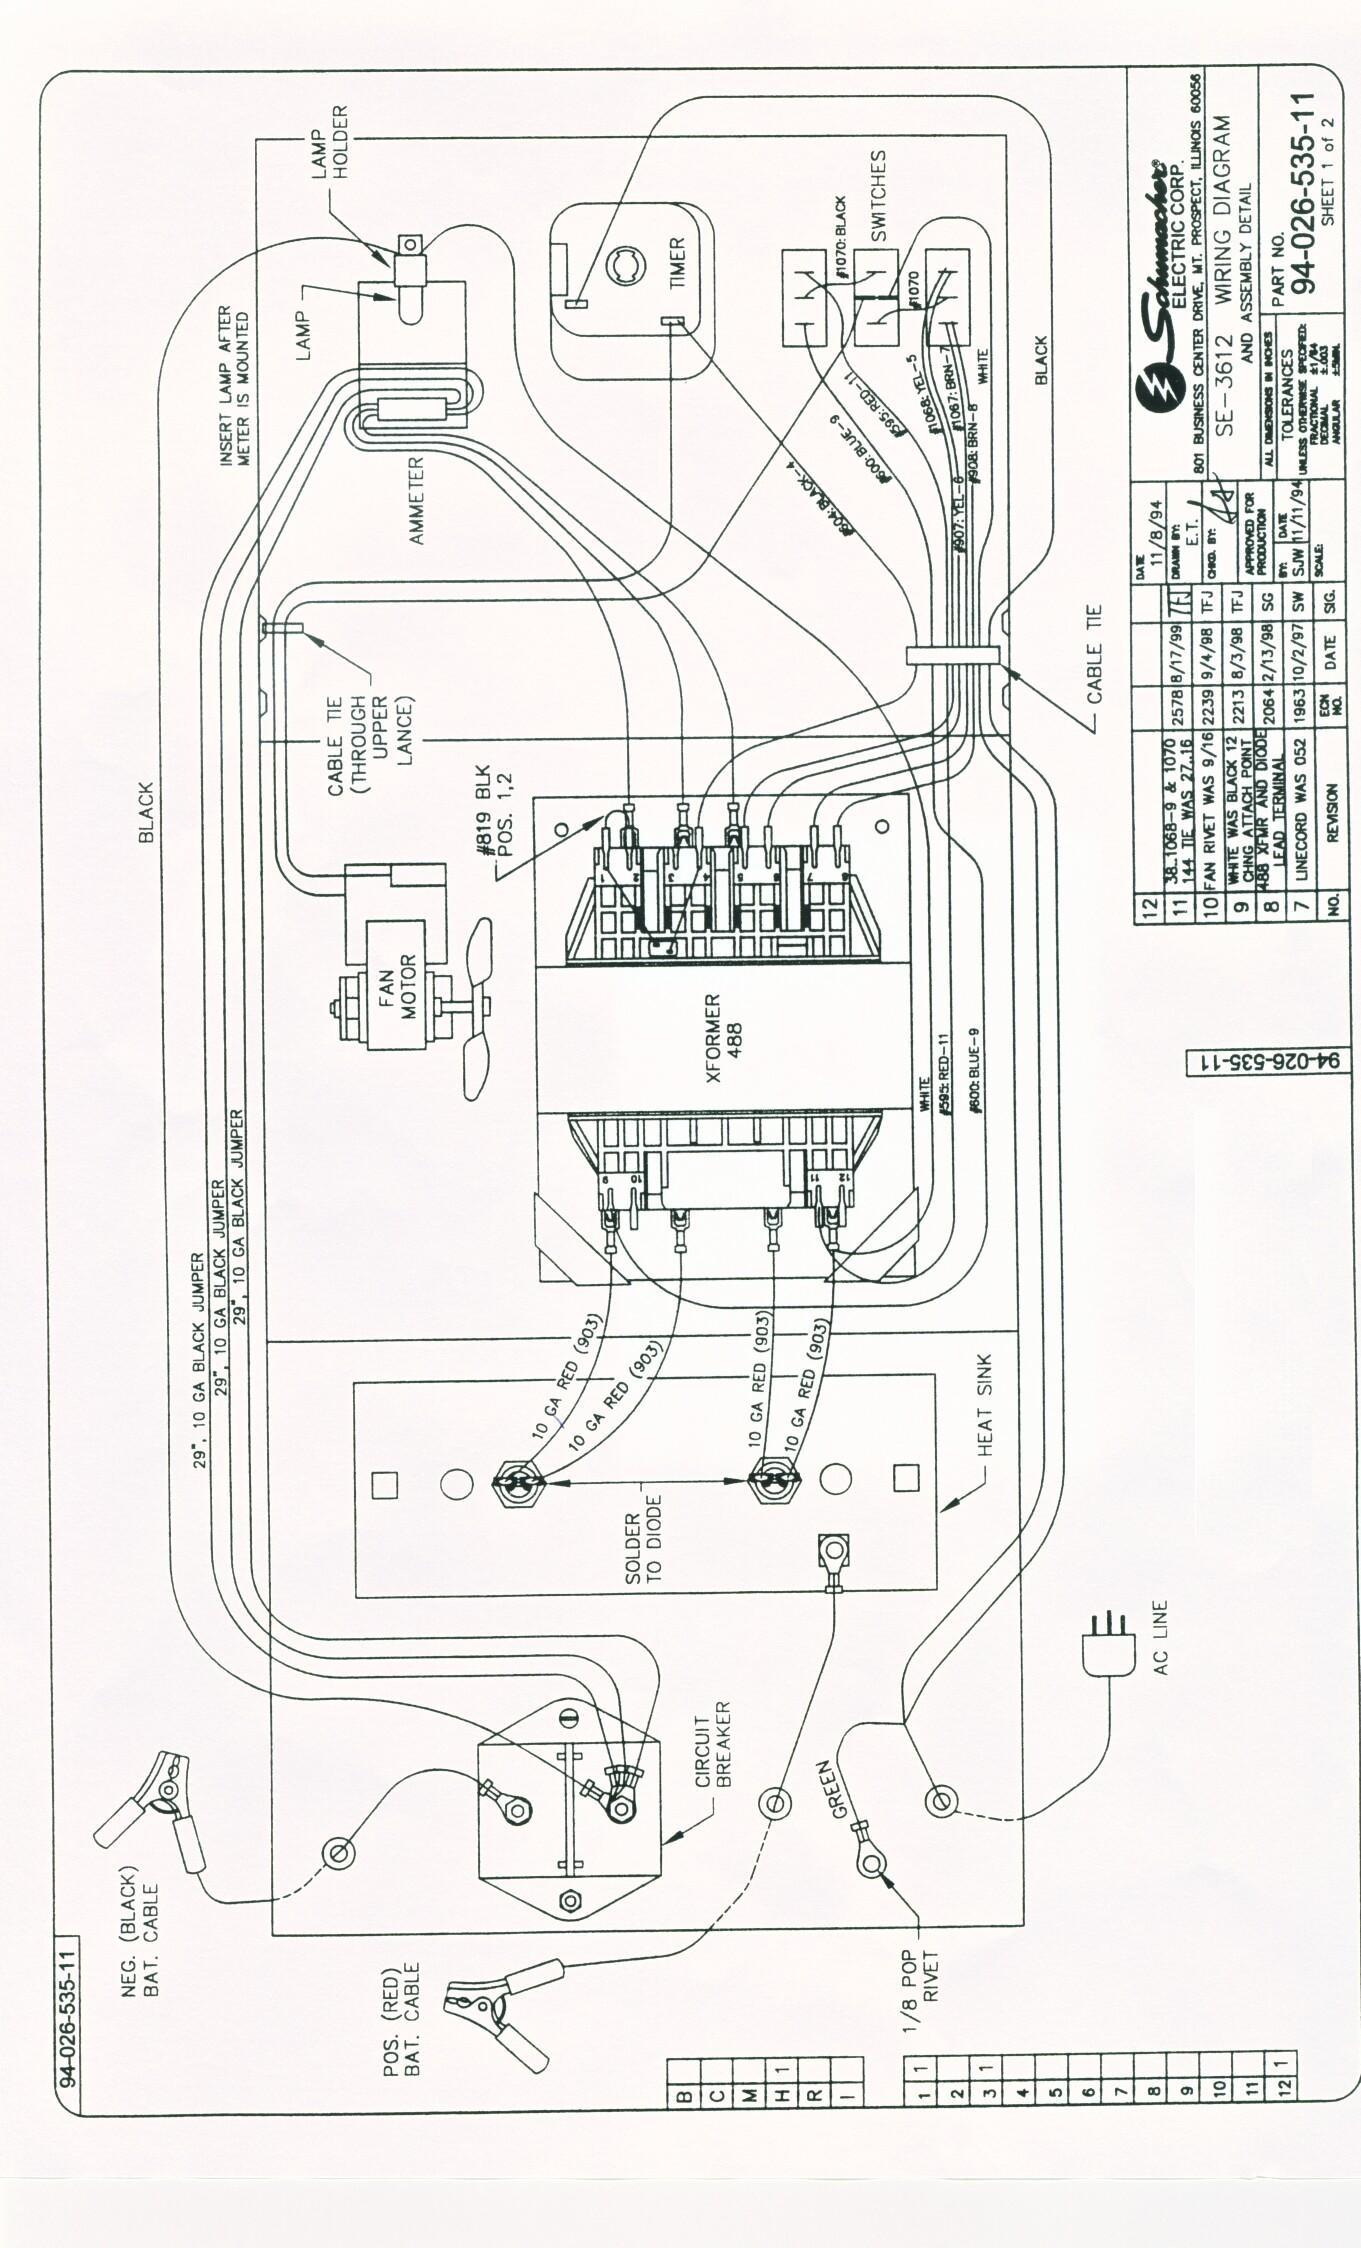 ps3000 schumacher battery charger wiring diagram best